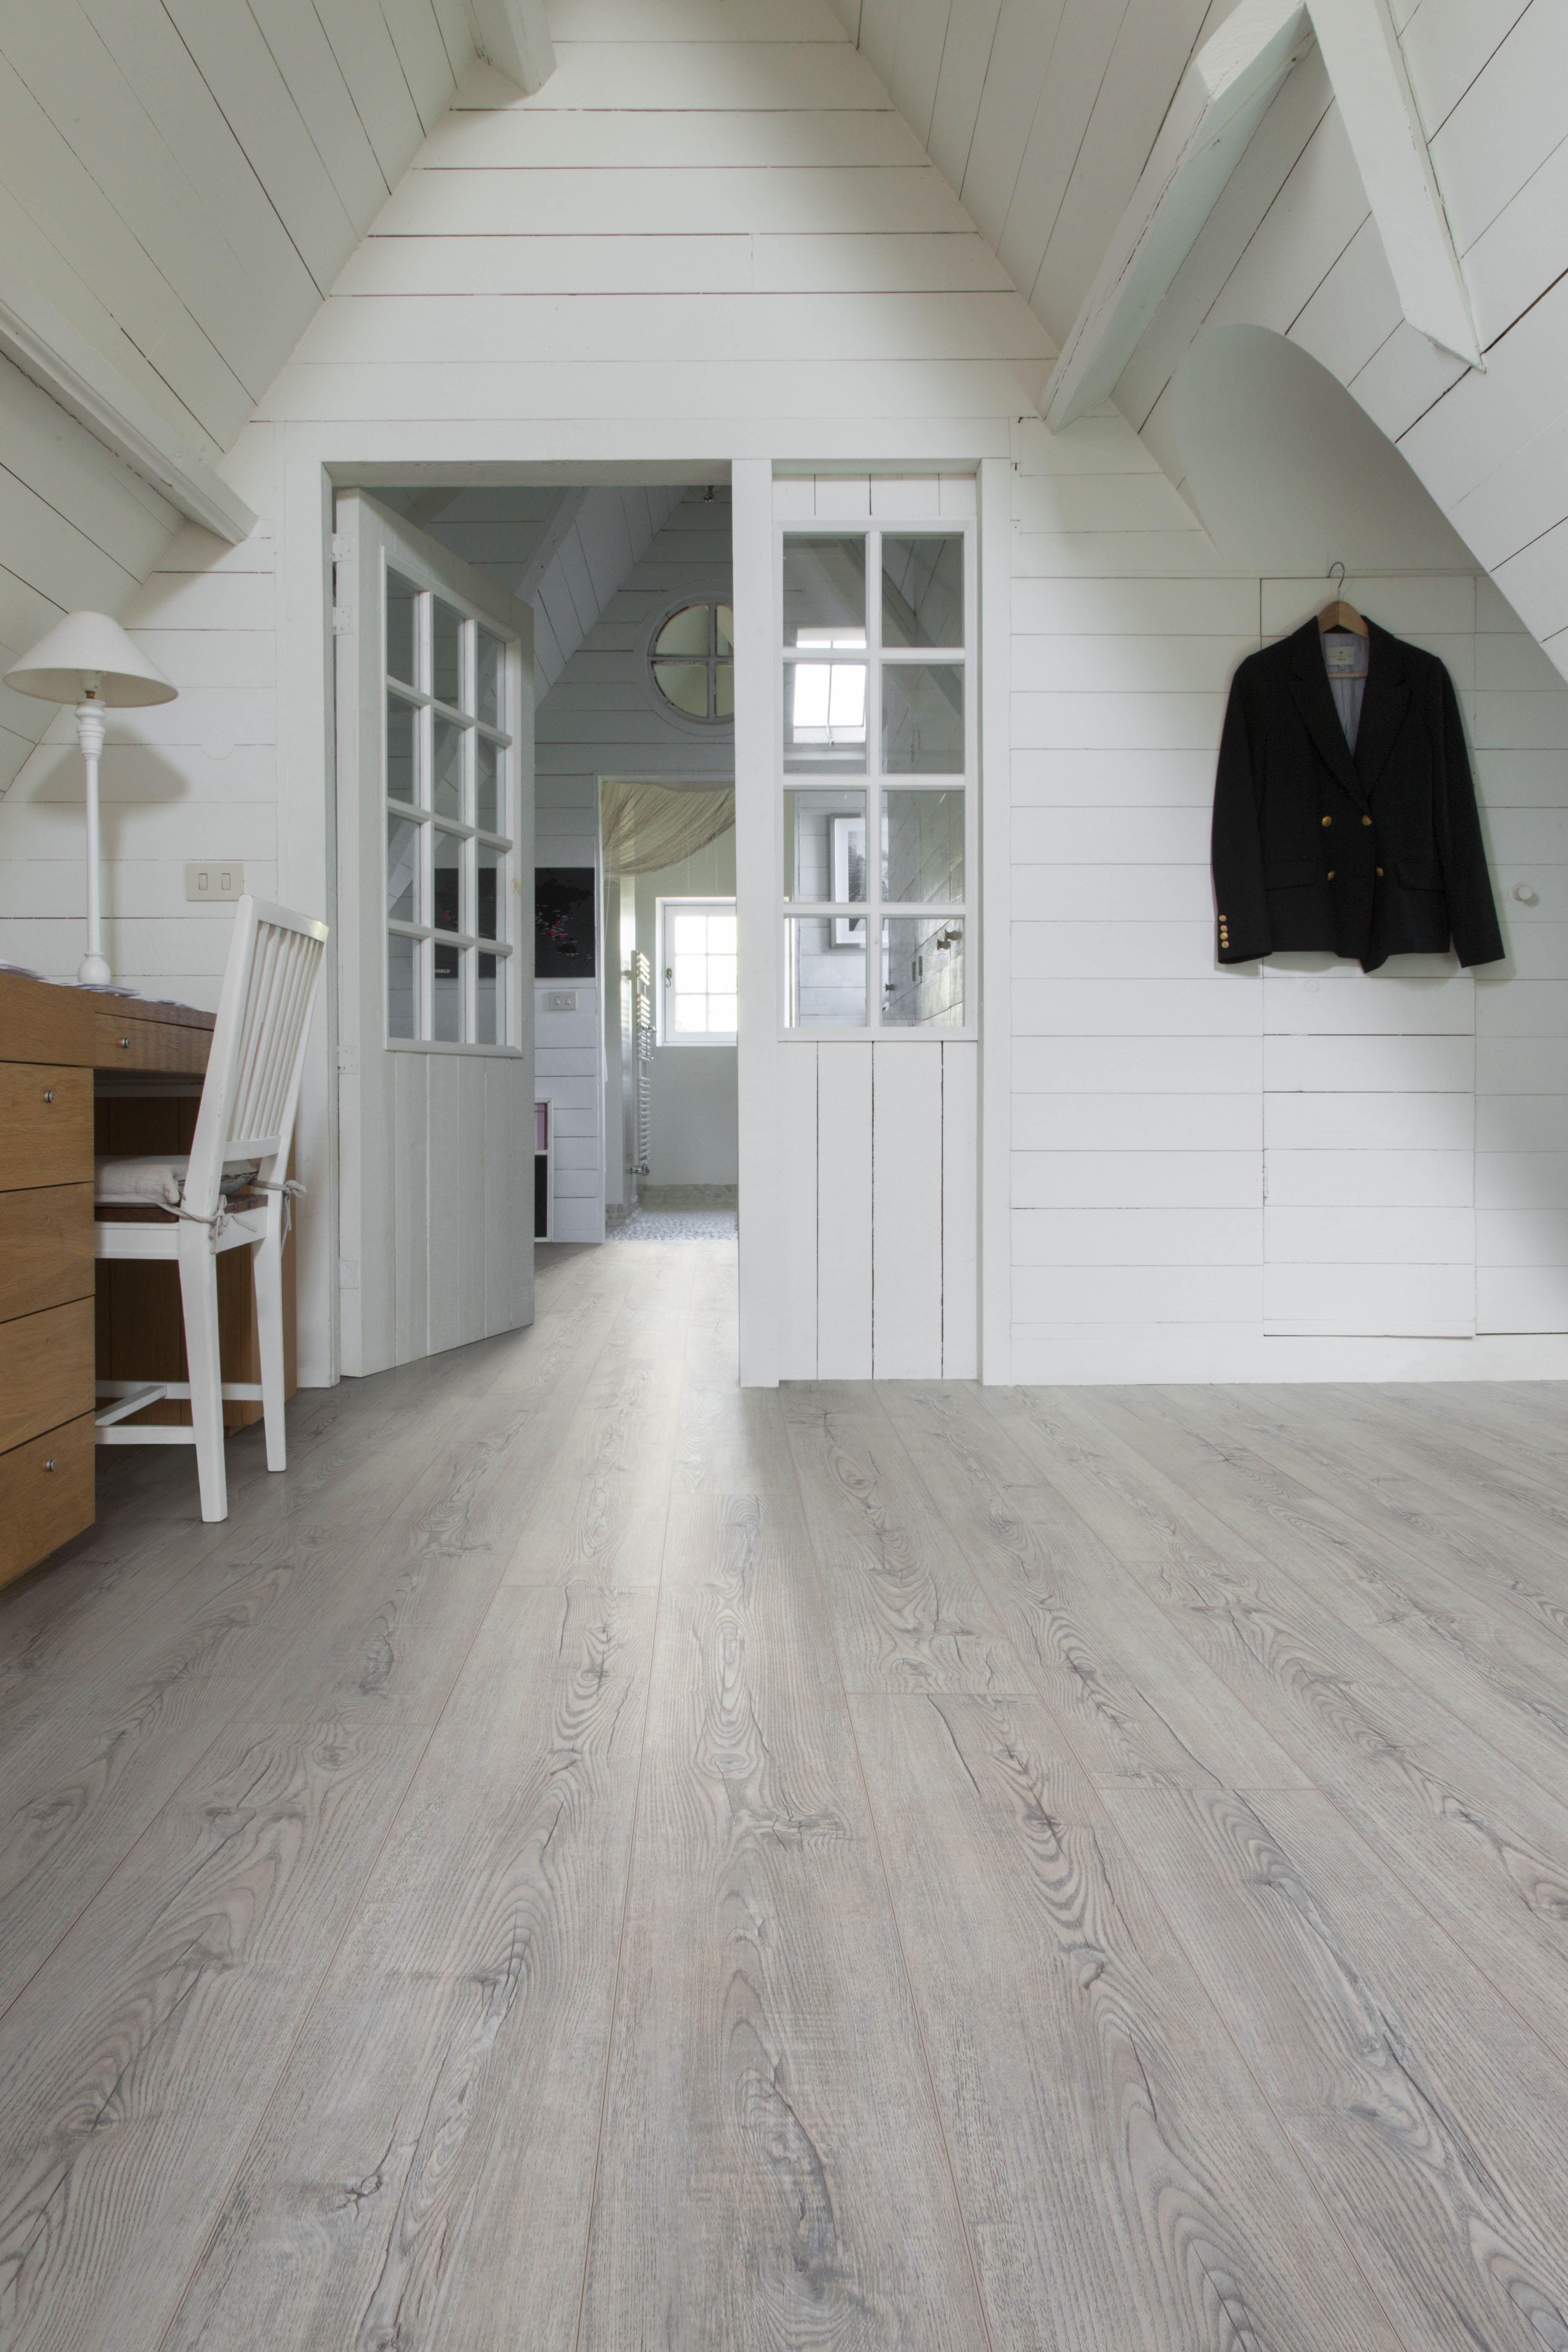 coretec hd 50lvr641 timberland rustic pine in 2019. Black Bedroom Furniture Sets. Home Design Ideas